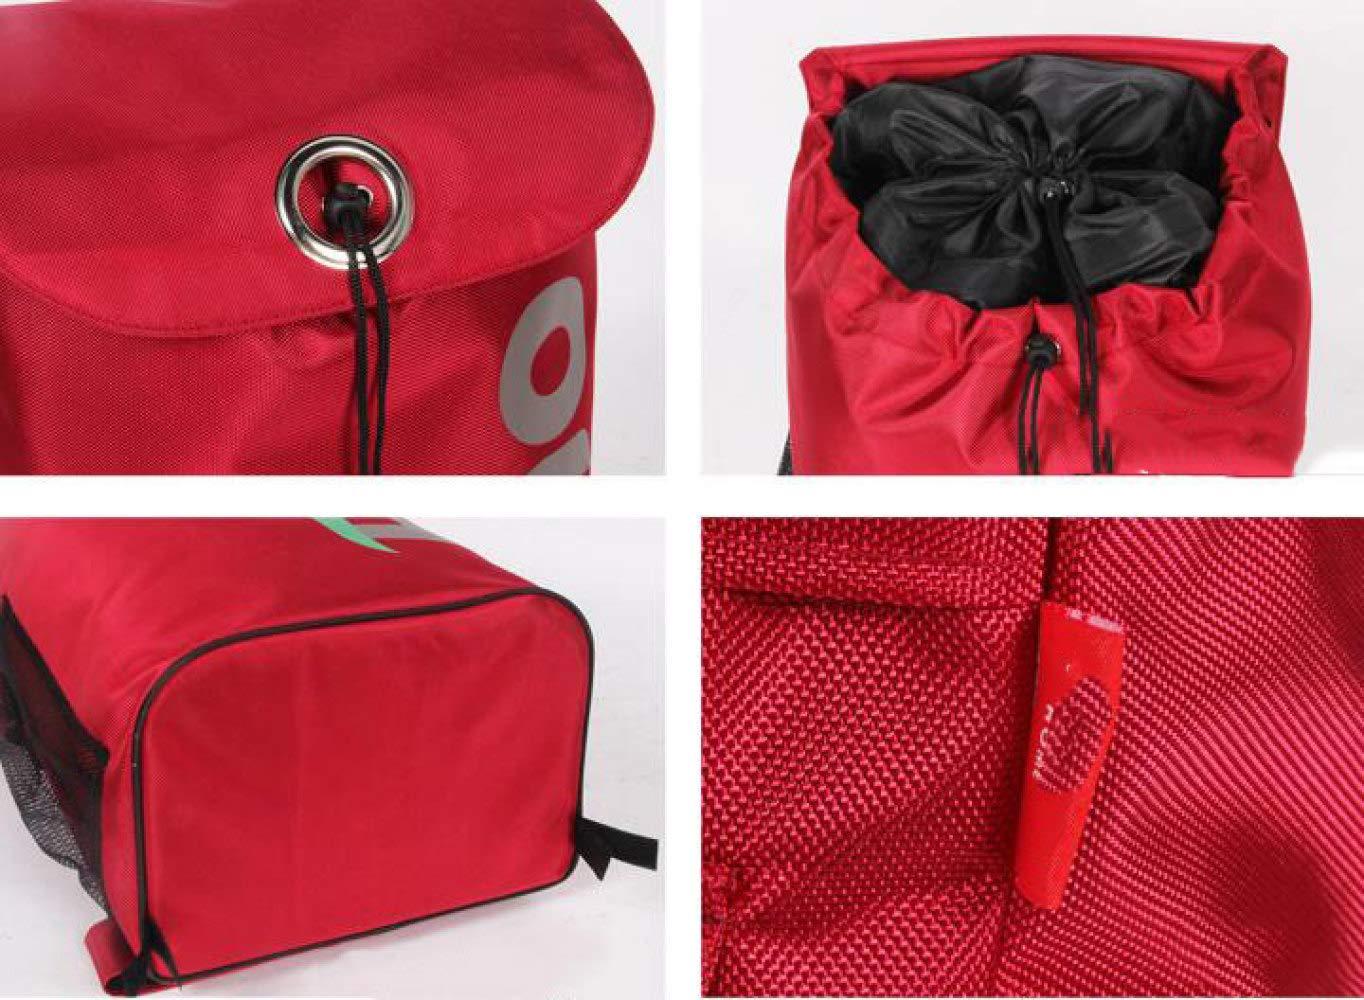 Trolley Aluminum Alloy Portable Shopping Foldable Luggage Cart,Blue